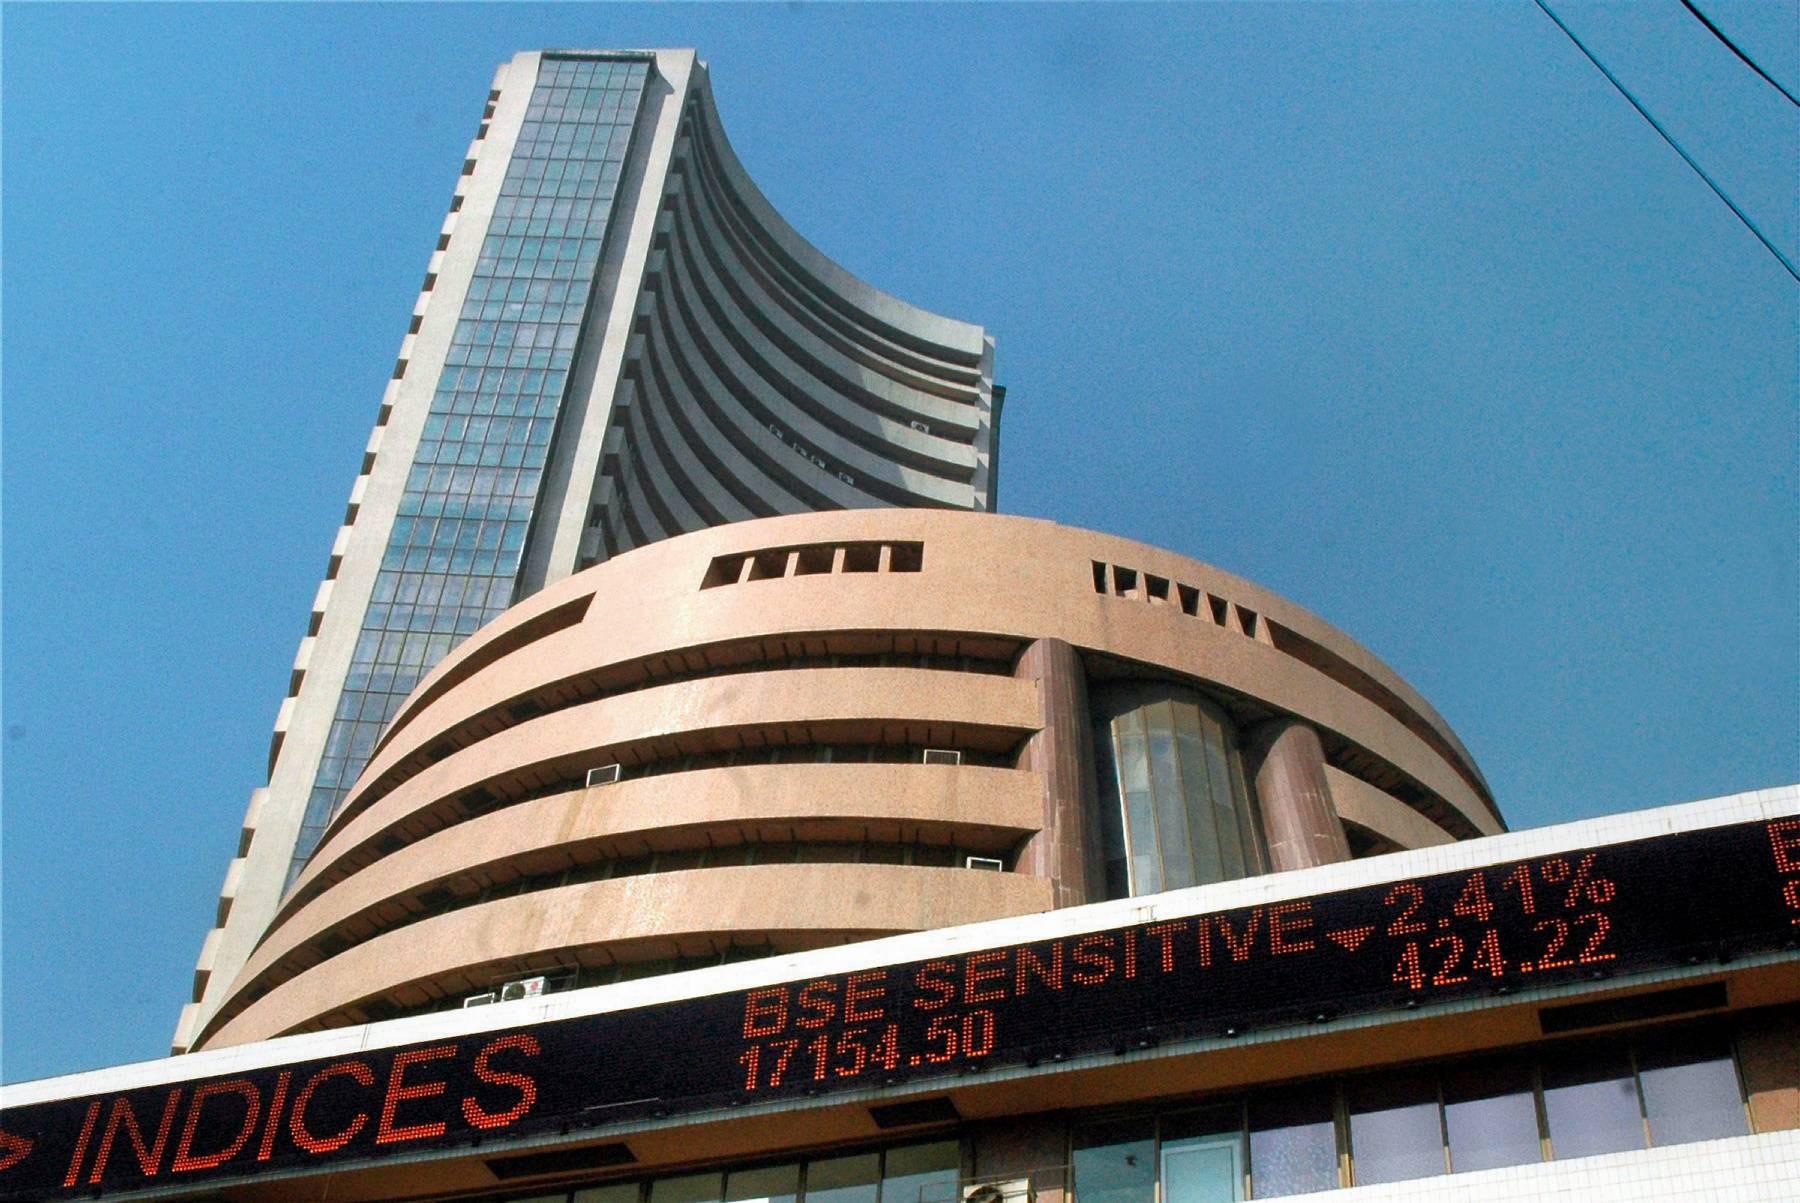 Sensex, BSE Sensex, Sensex today, morning sensex